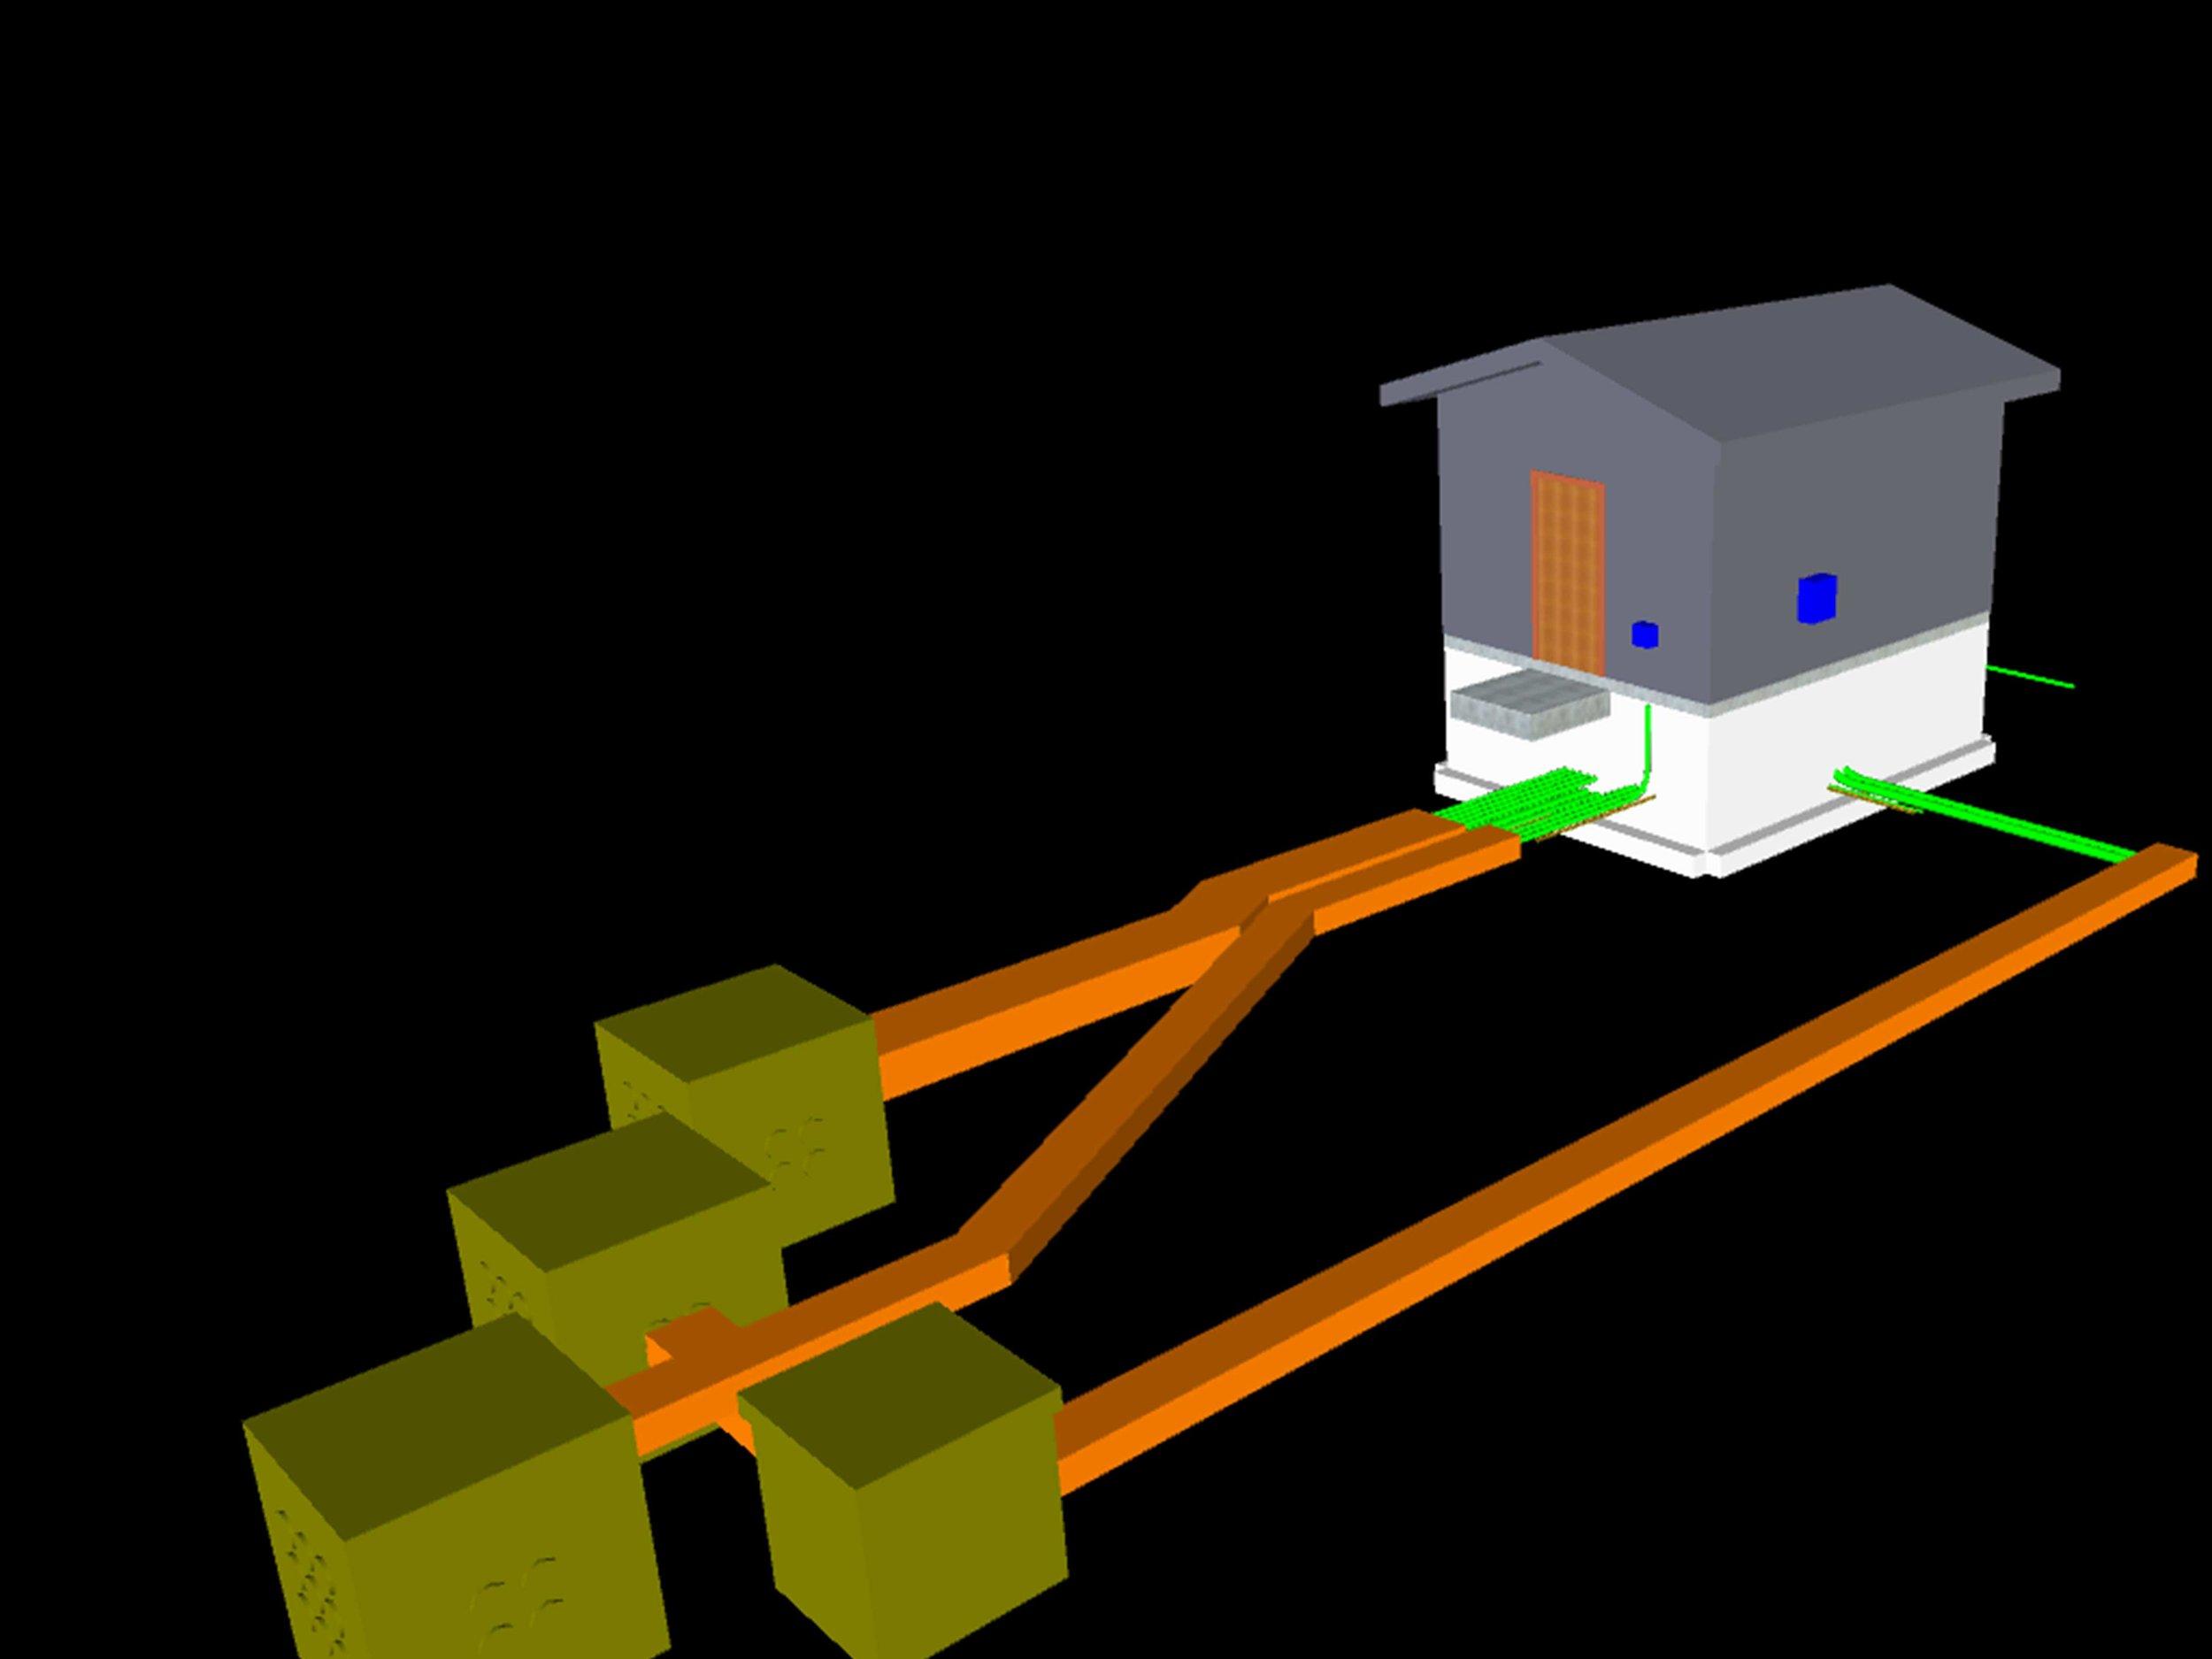 aldridge-electric-bim-prefab-project-planning-top-utlity-contractor-sub-general-nationwide.jpg